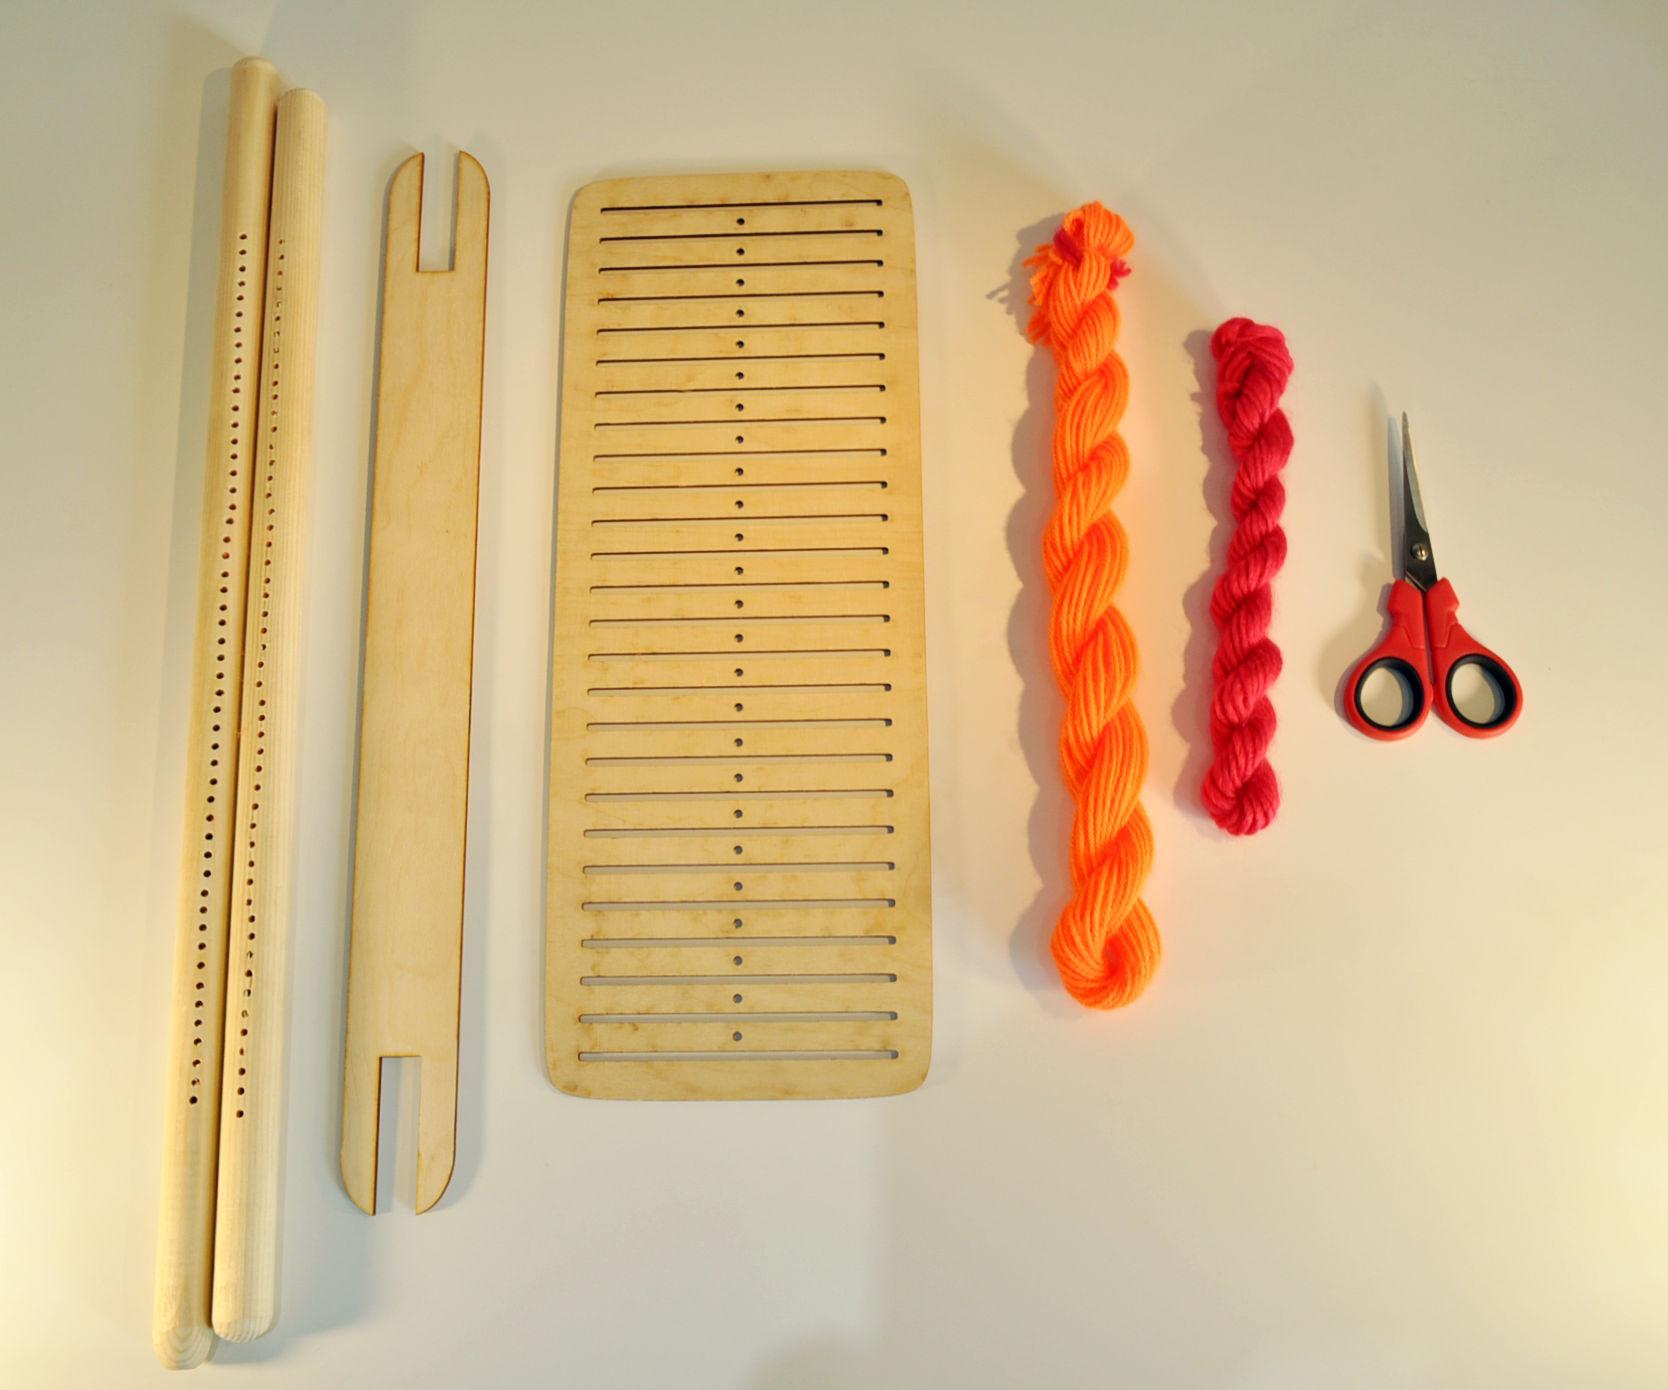 Kite weaving